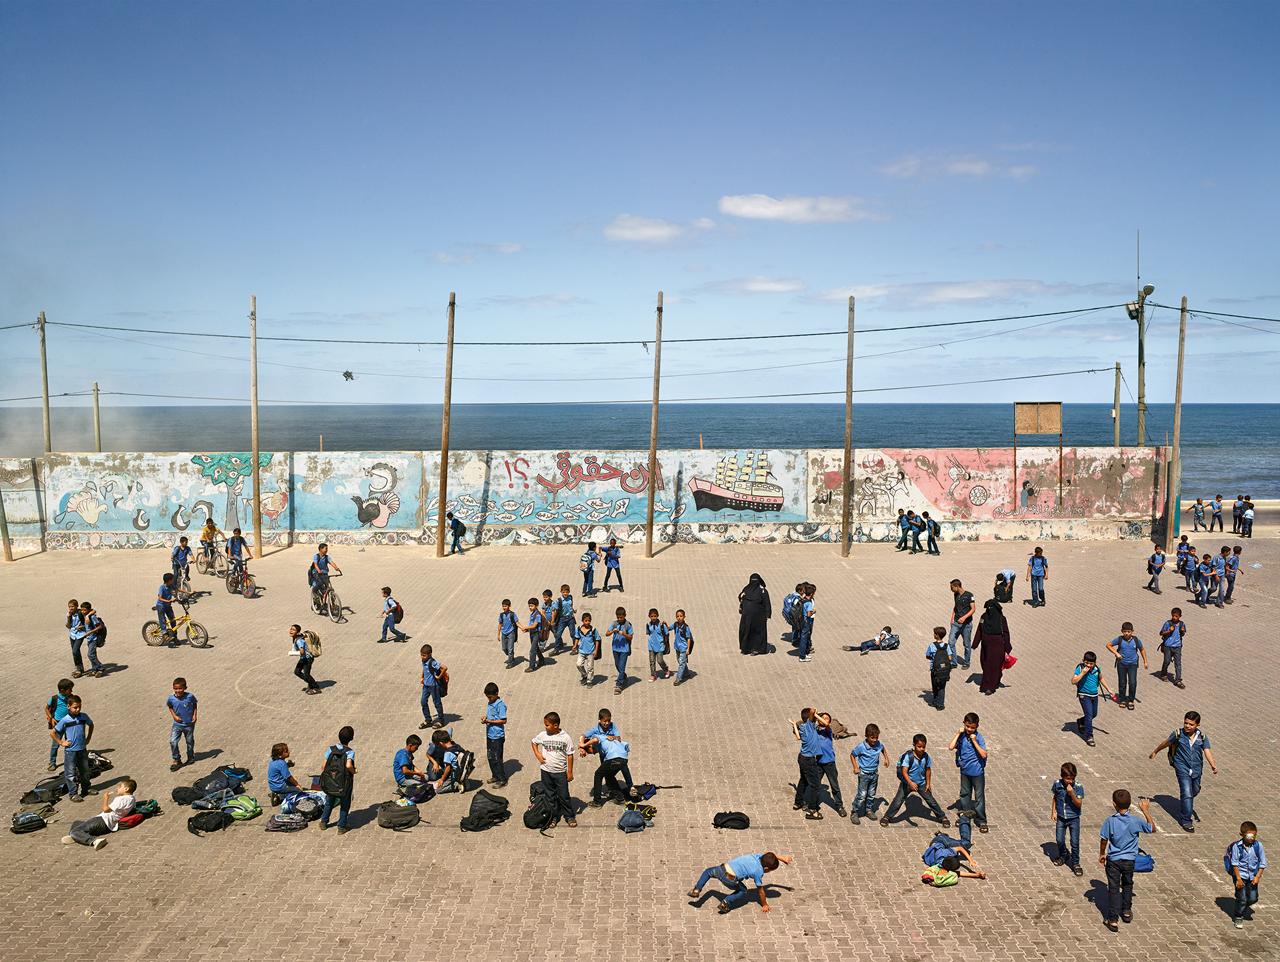 JAMES MOLLISON,  Deir al-Balah Boys' Elementary, Middle Area, Gaza,  September 16, 2013